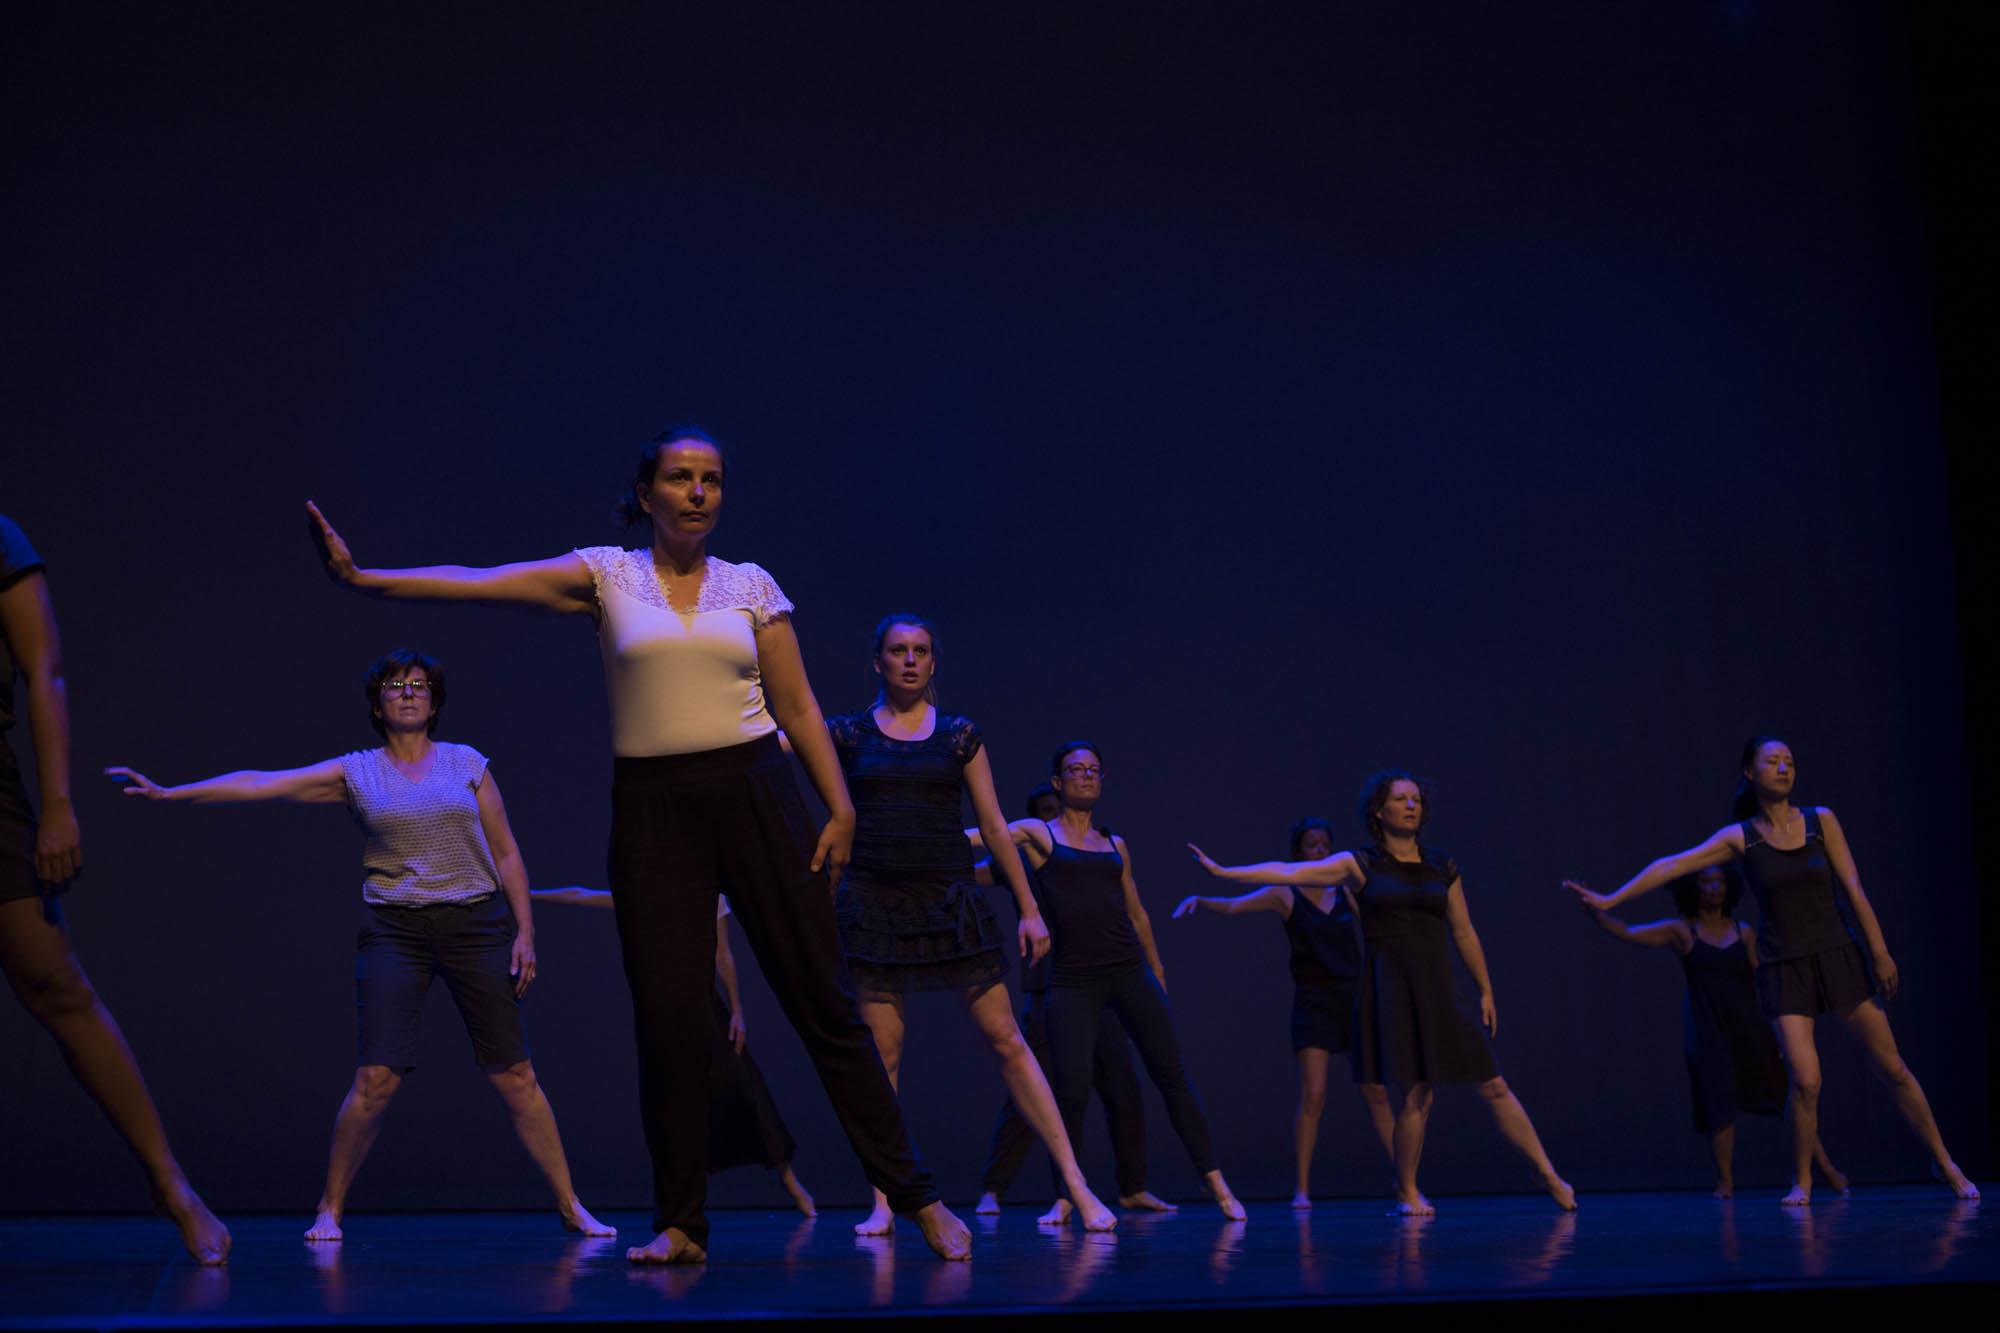 http://danse-modernjazz.com/wp-content/uploads/2020/03/danse-montrouge_039.jpg